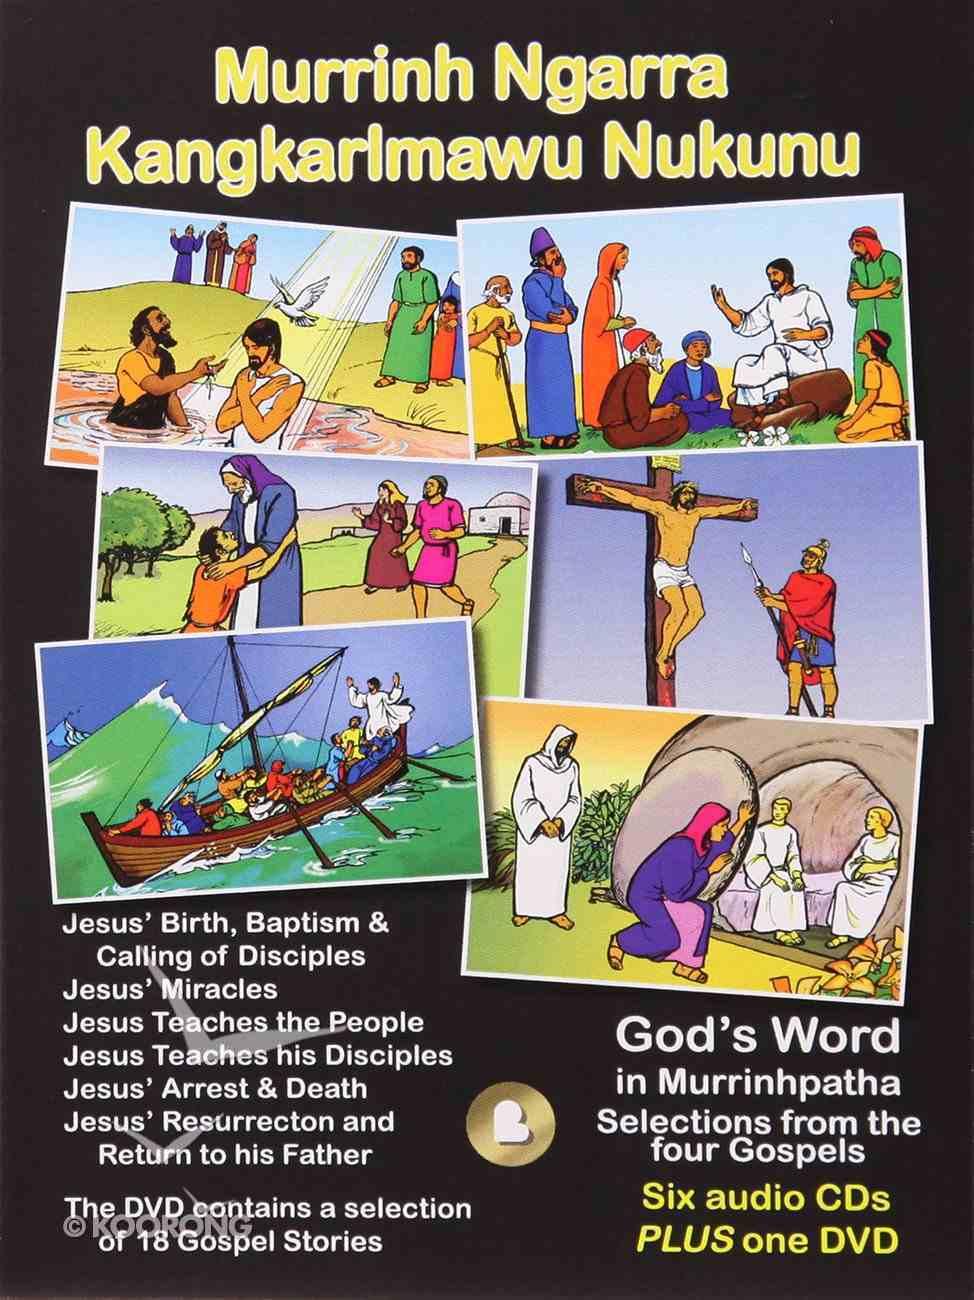 Murrinhpatha God's Word (6 Cds & 1 Dvd) CD